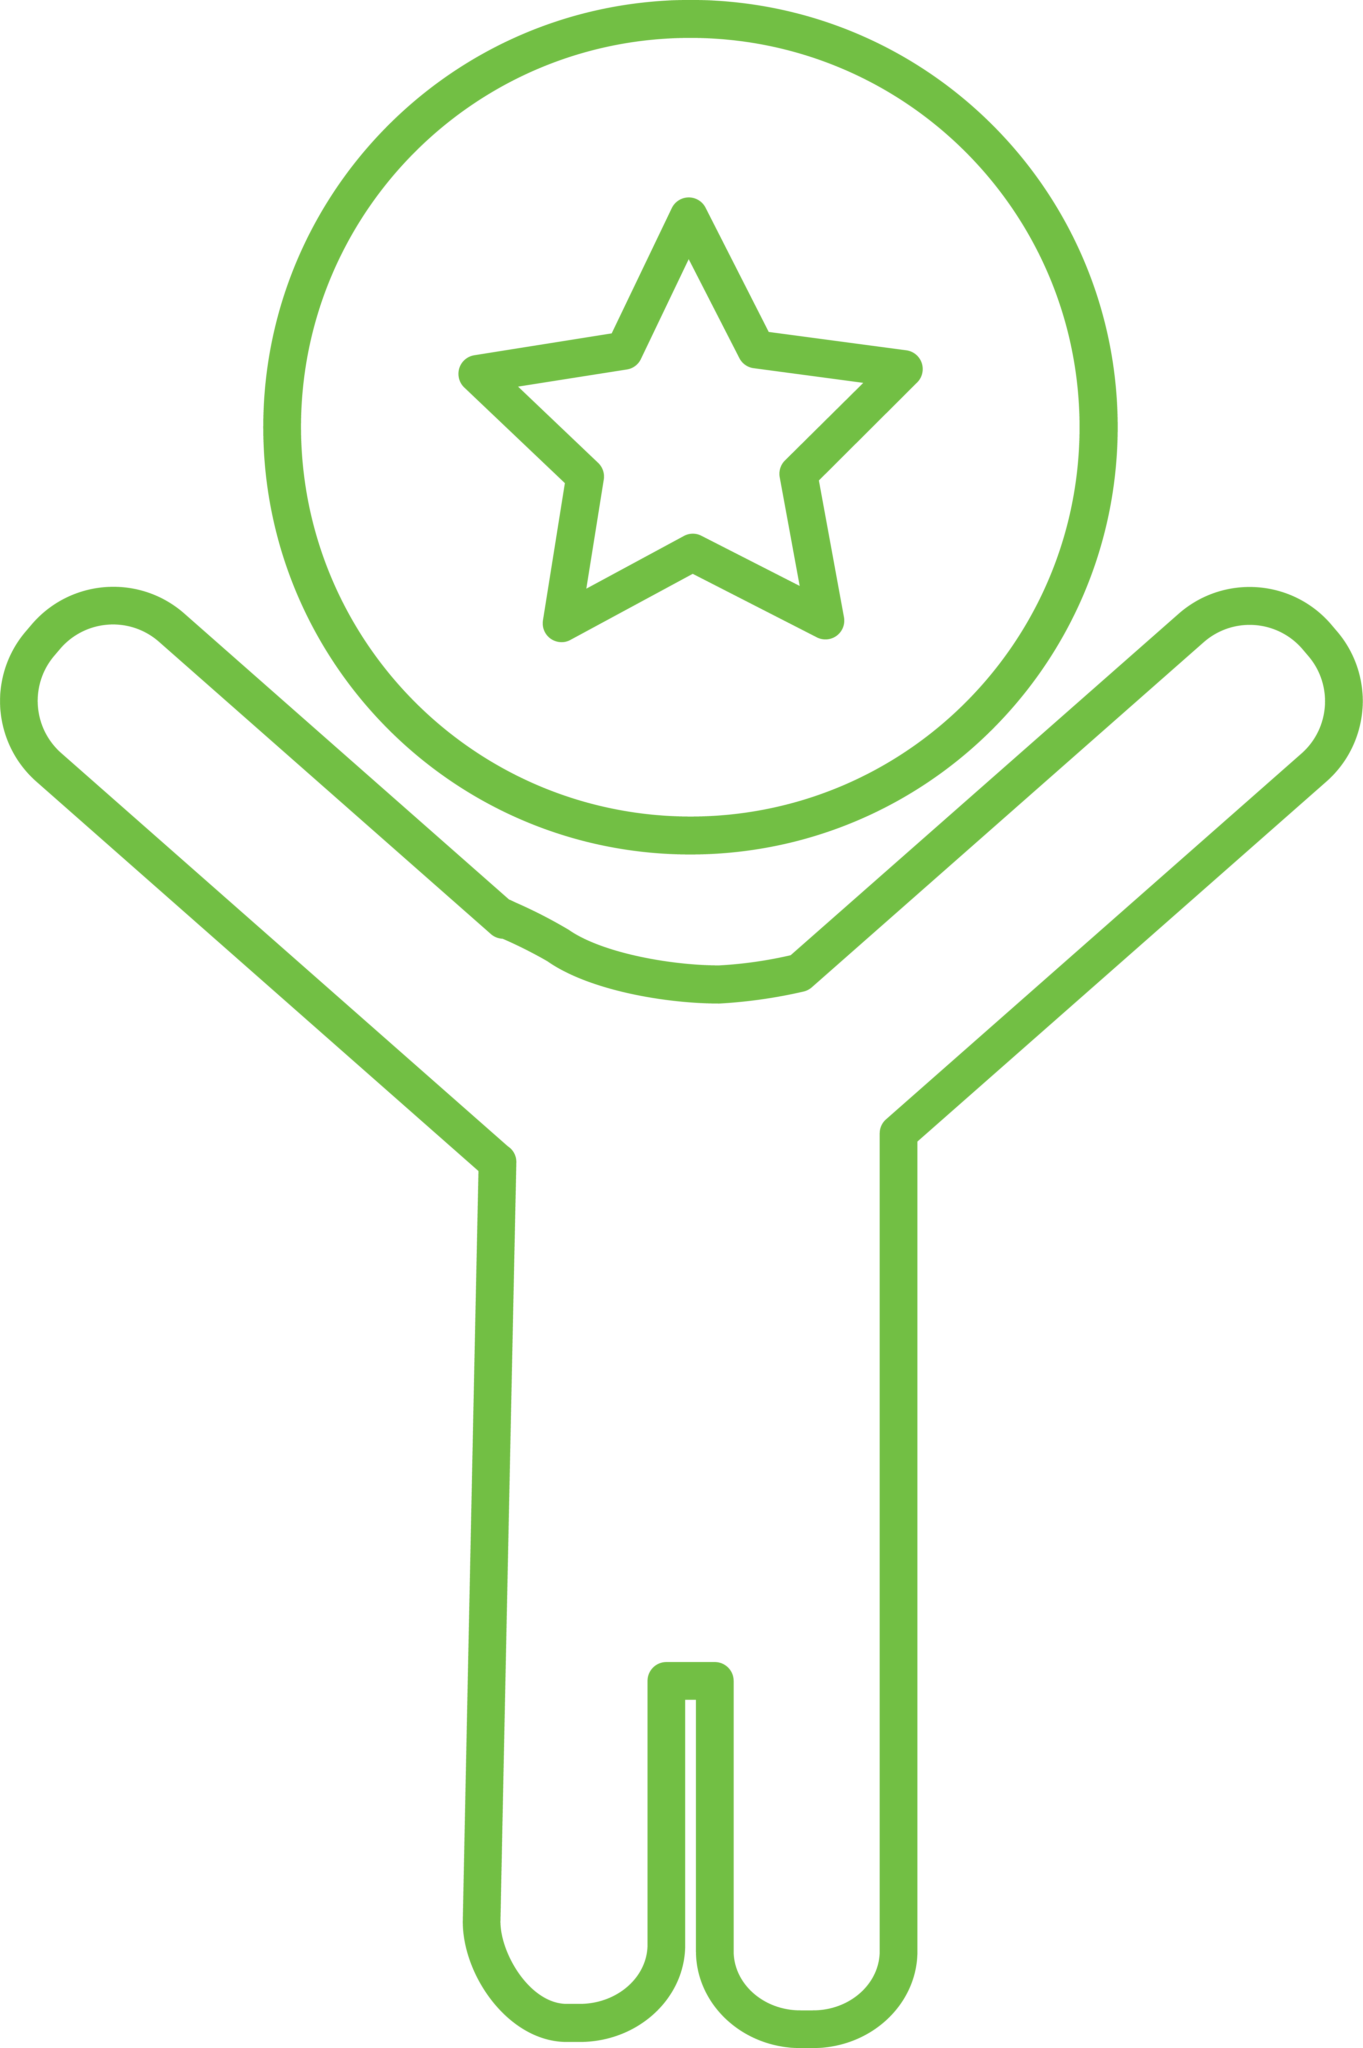 increase customer satisfaction